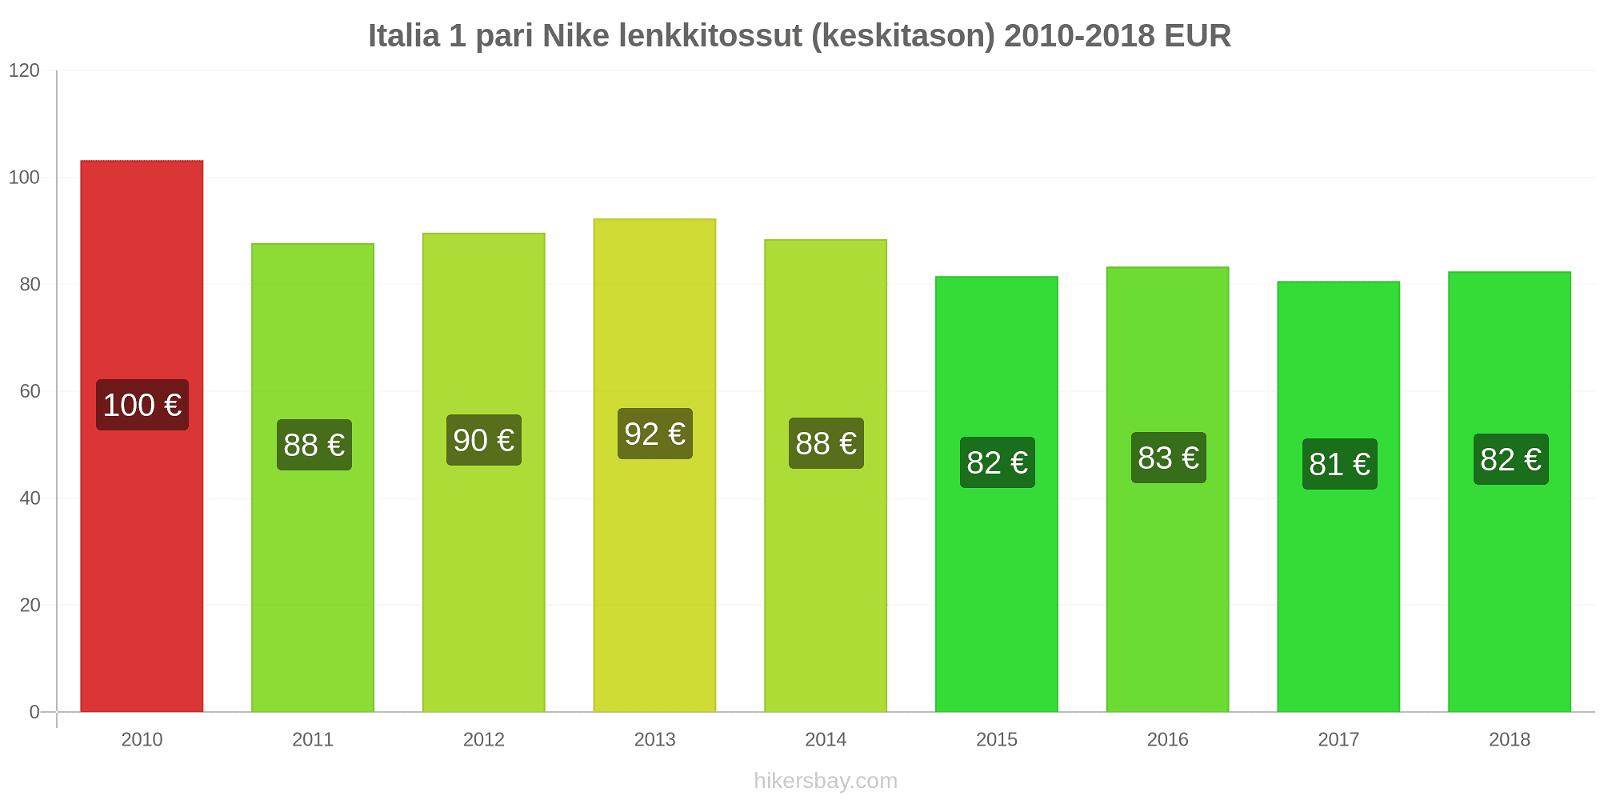 Italia hintojen muutokset 1 pari Nike lenkkitossut (keskitason) hikersbay.com